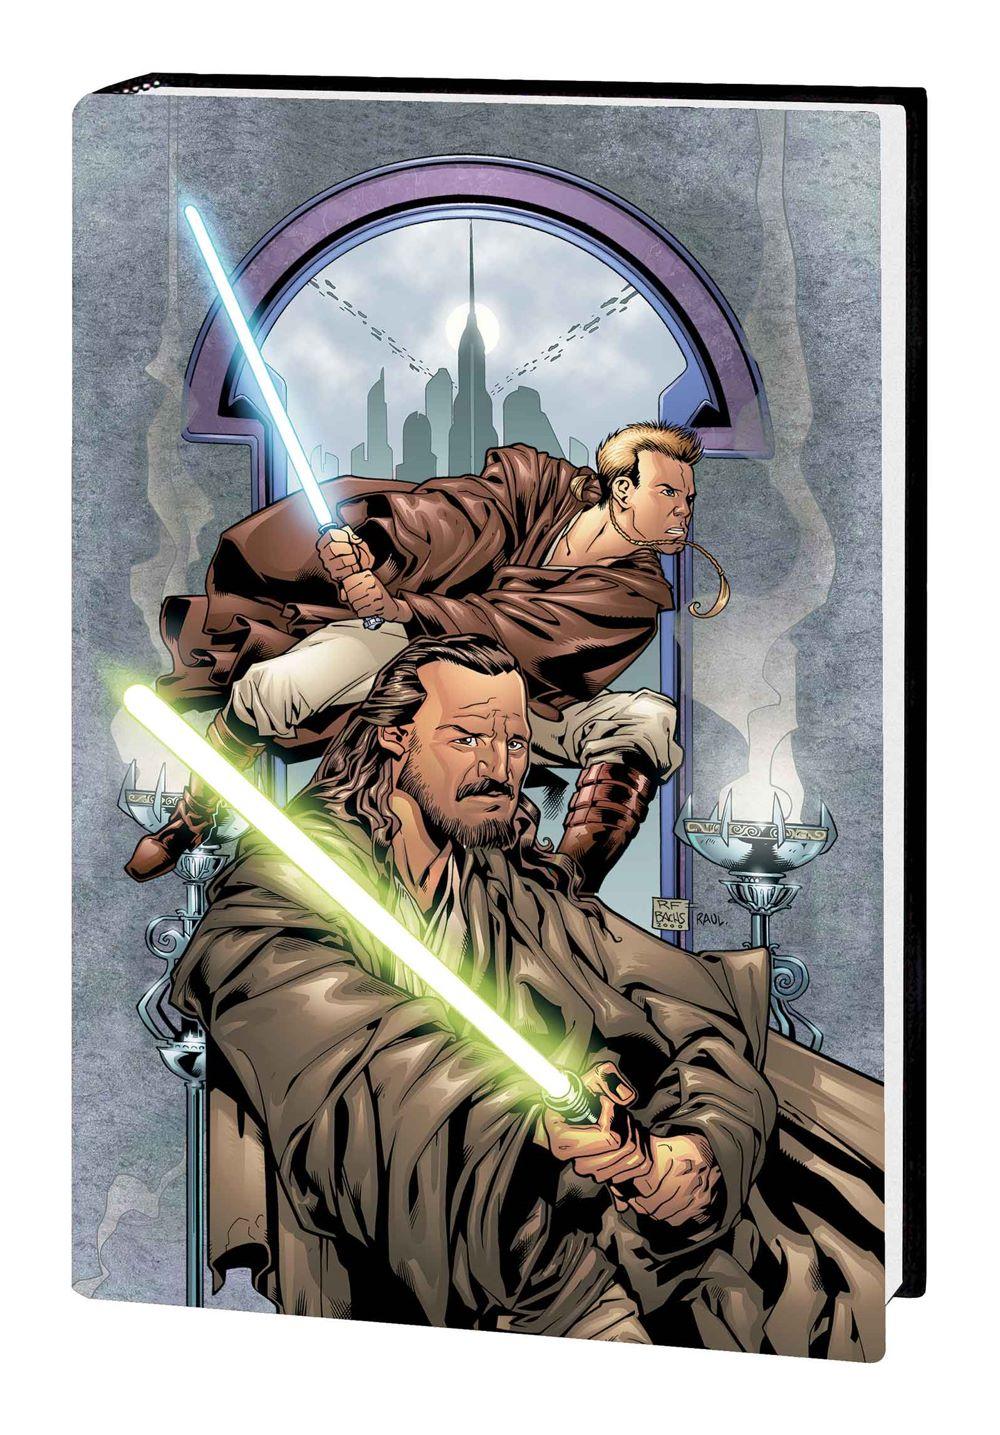 STAR_WARS_LED_ROTS_BACHS_HC Marvel Comics June 2021 Solicitations